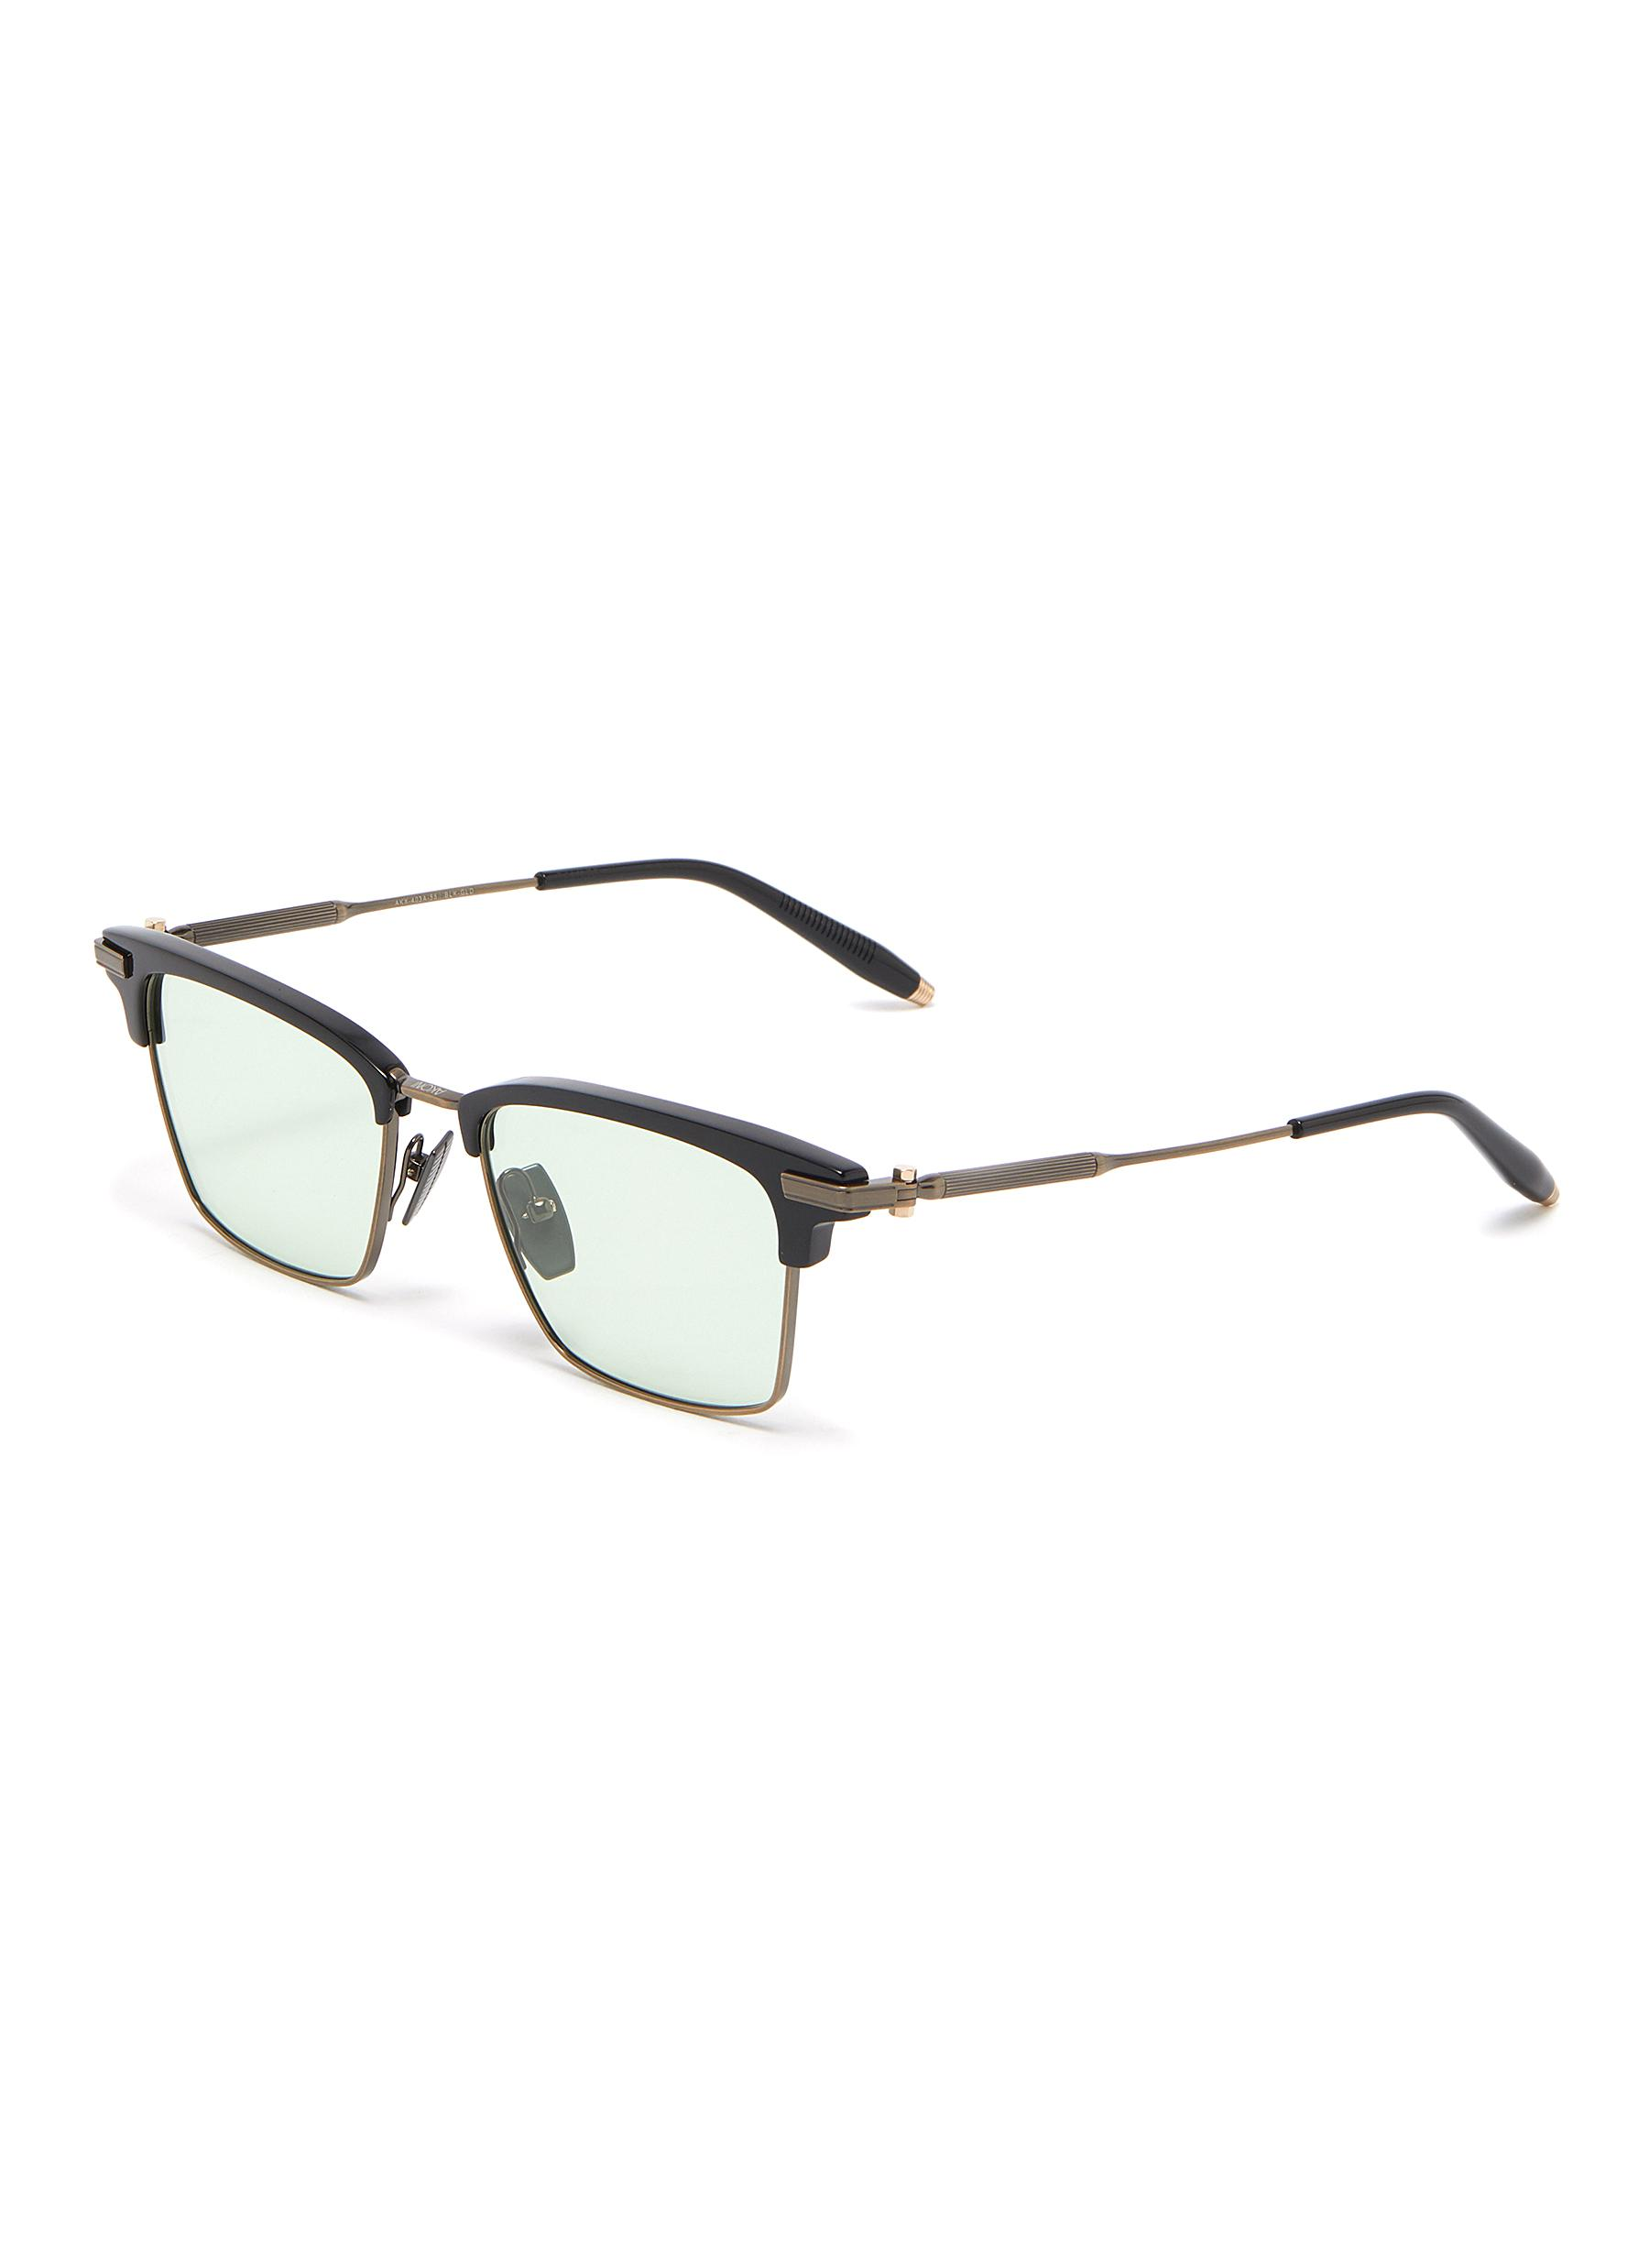 'Galileo' acetate browline optical glasses